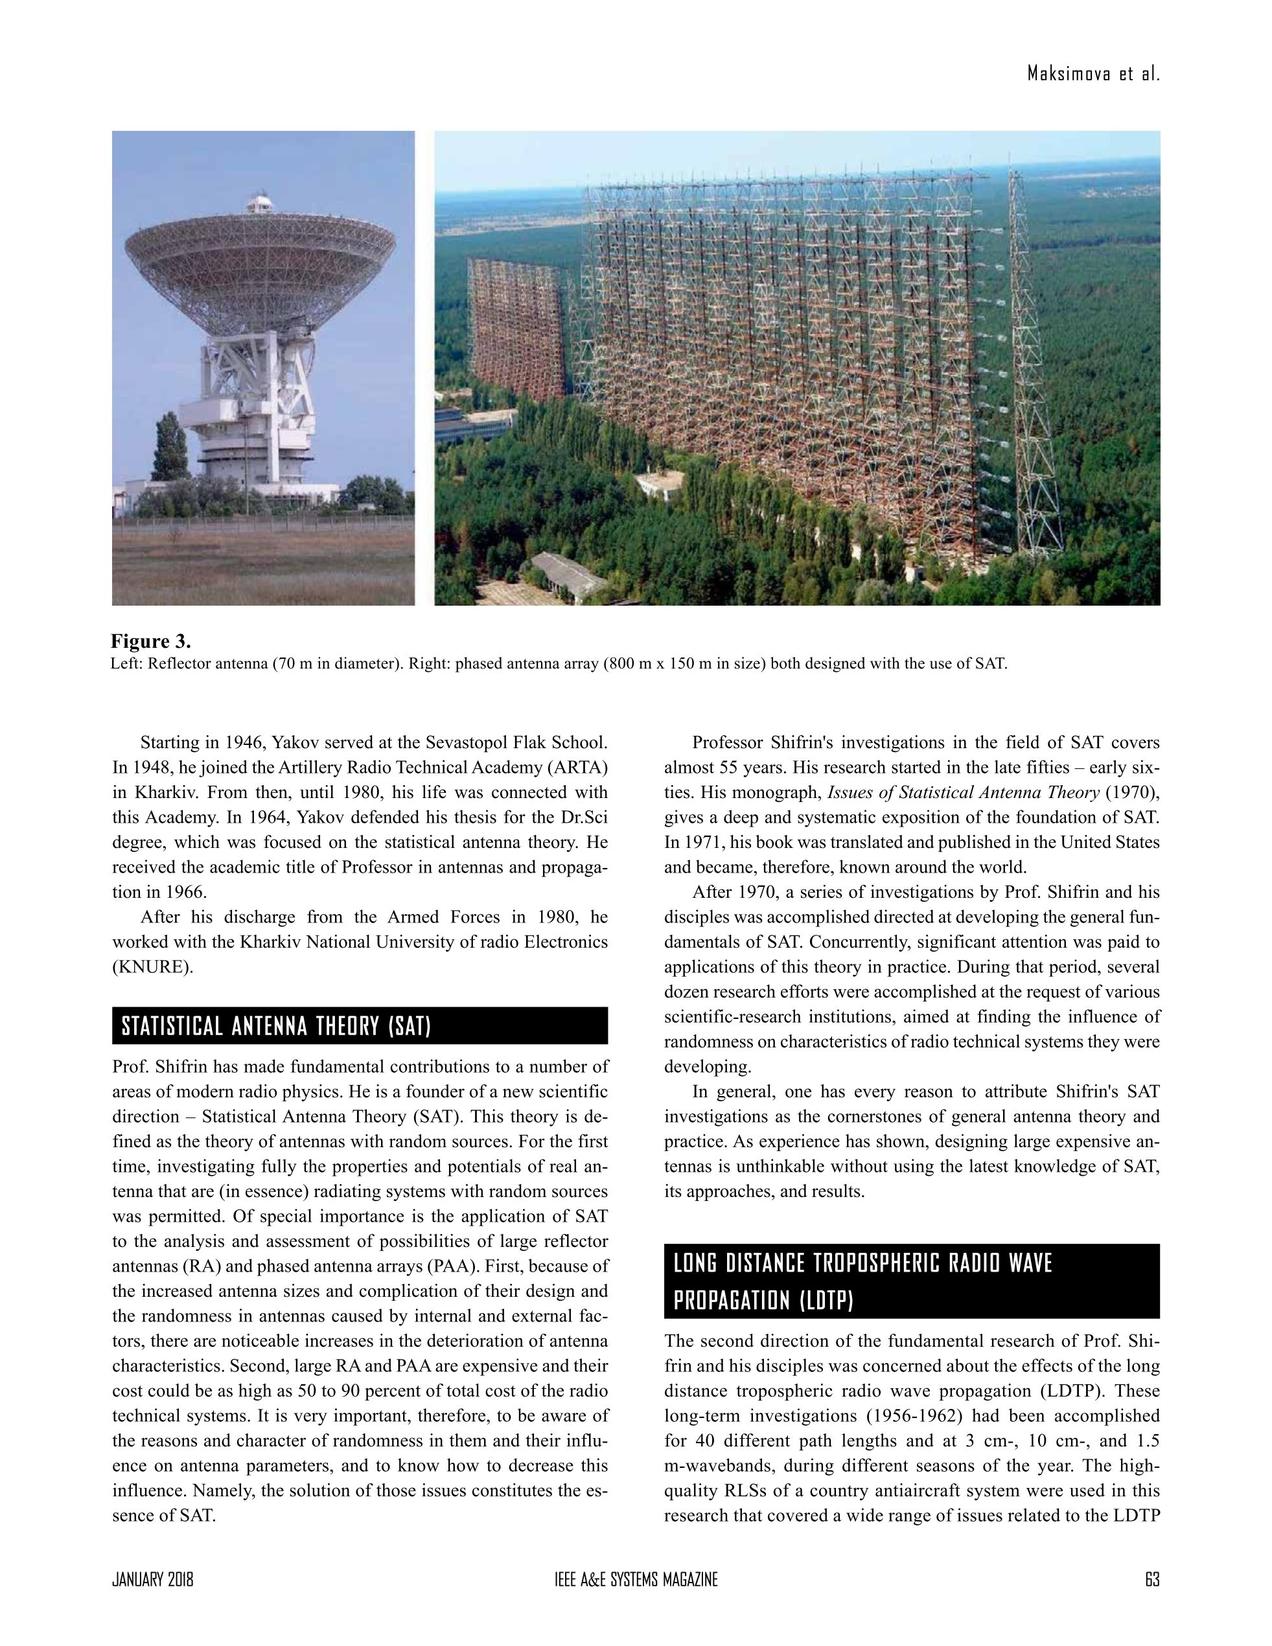 Aerospace and Electronic Systems Magazine January 2018